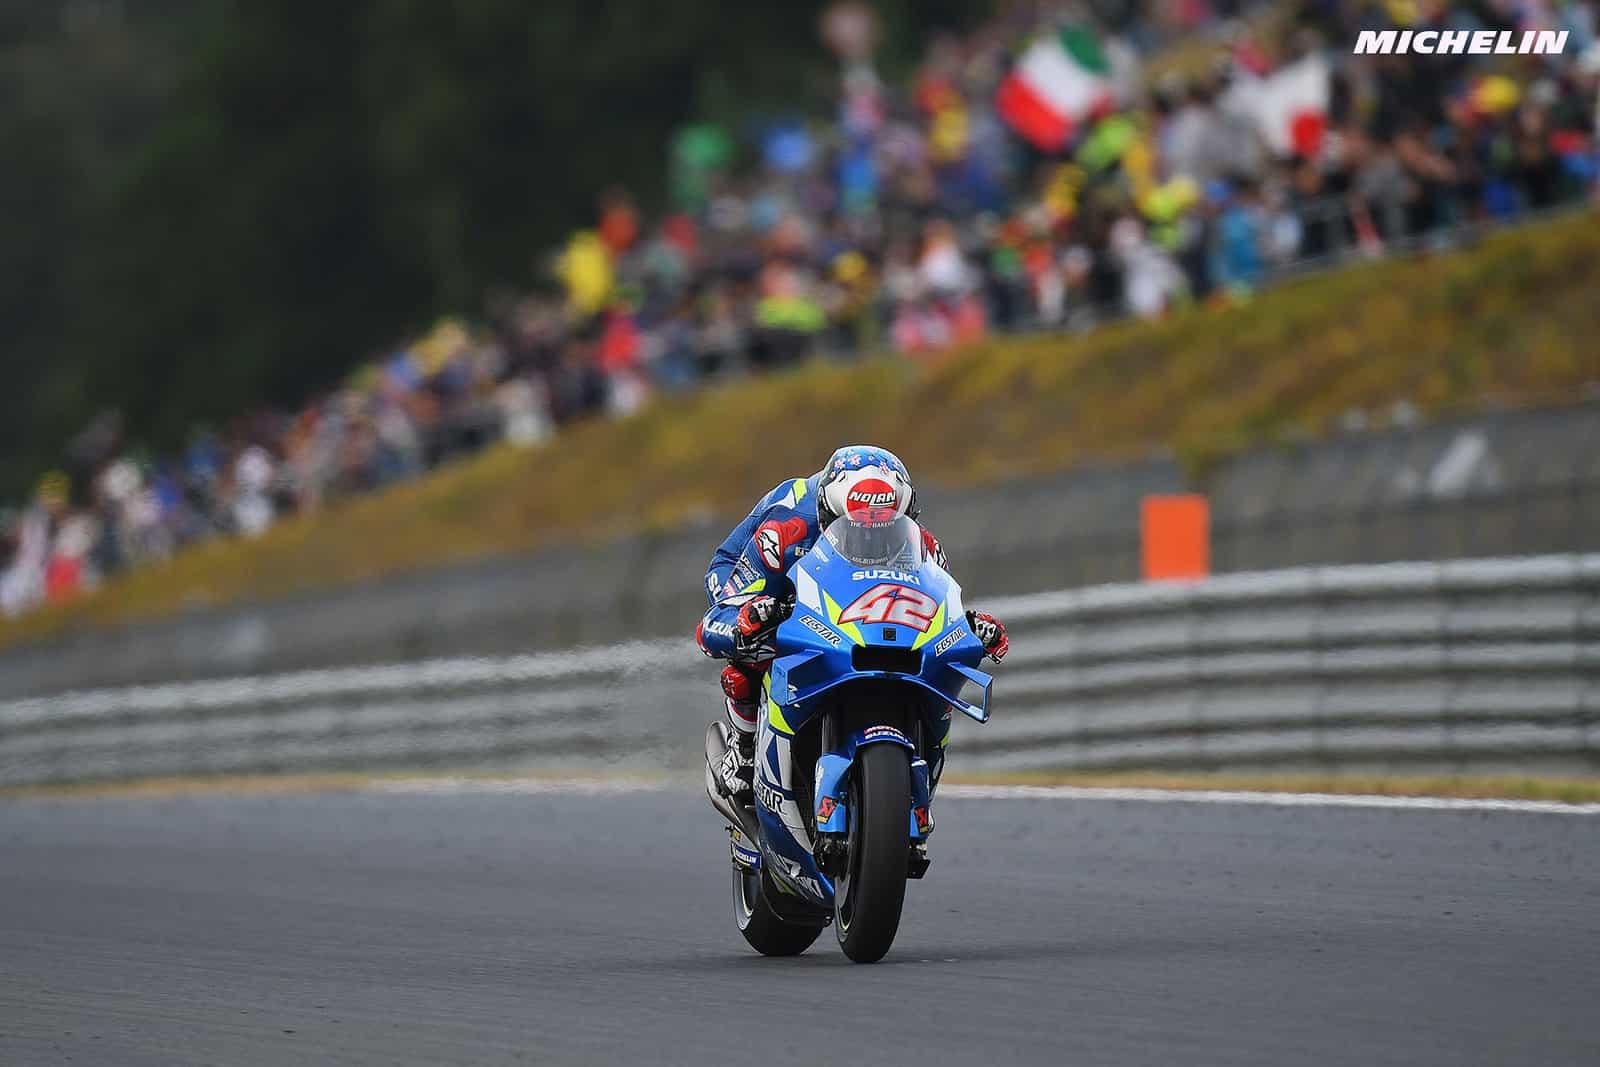 MotoGP2019日本GP 7位リンス「トップ5を狙えるポテンシャルはあった」